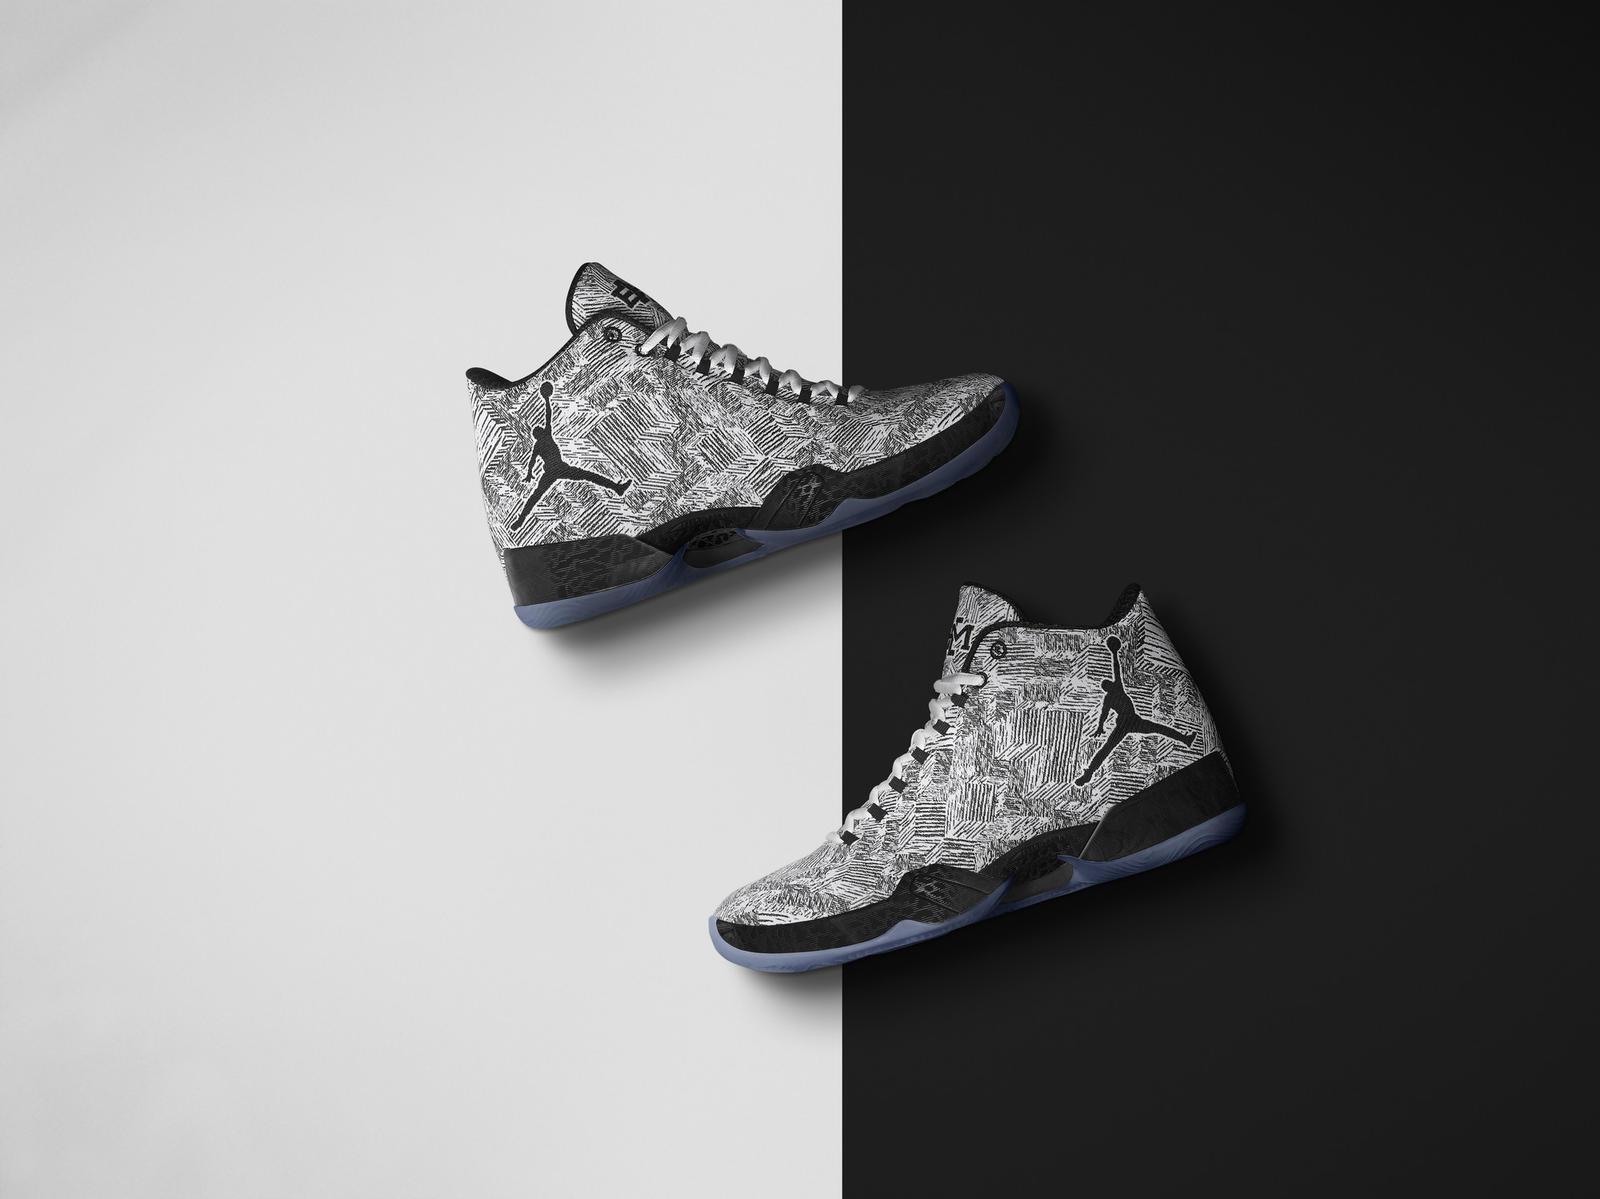 Nike_SP15_BHM_XX9_HERO_Final_native_1600